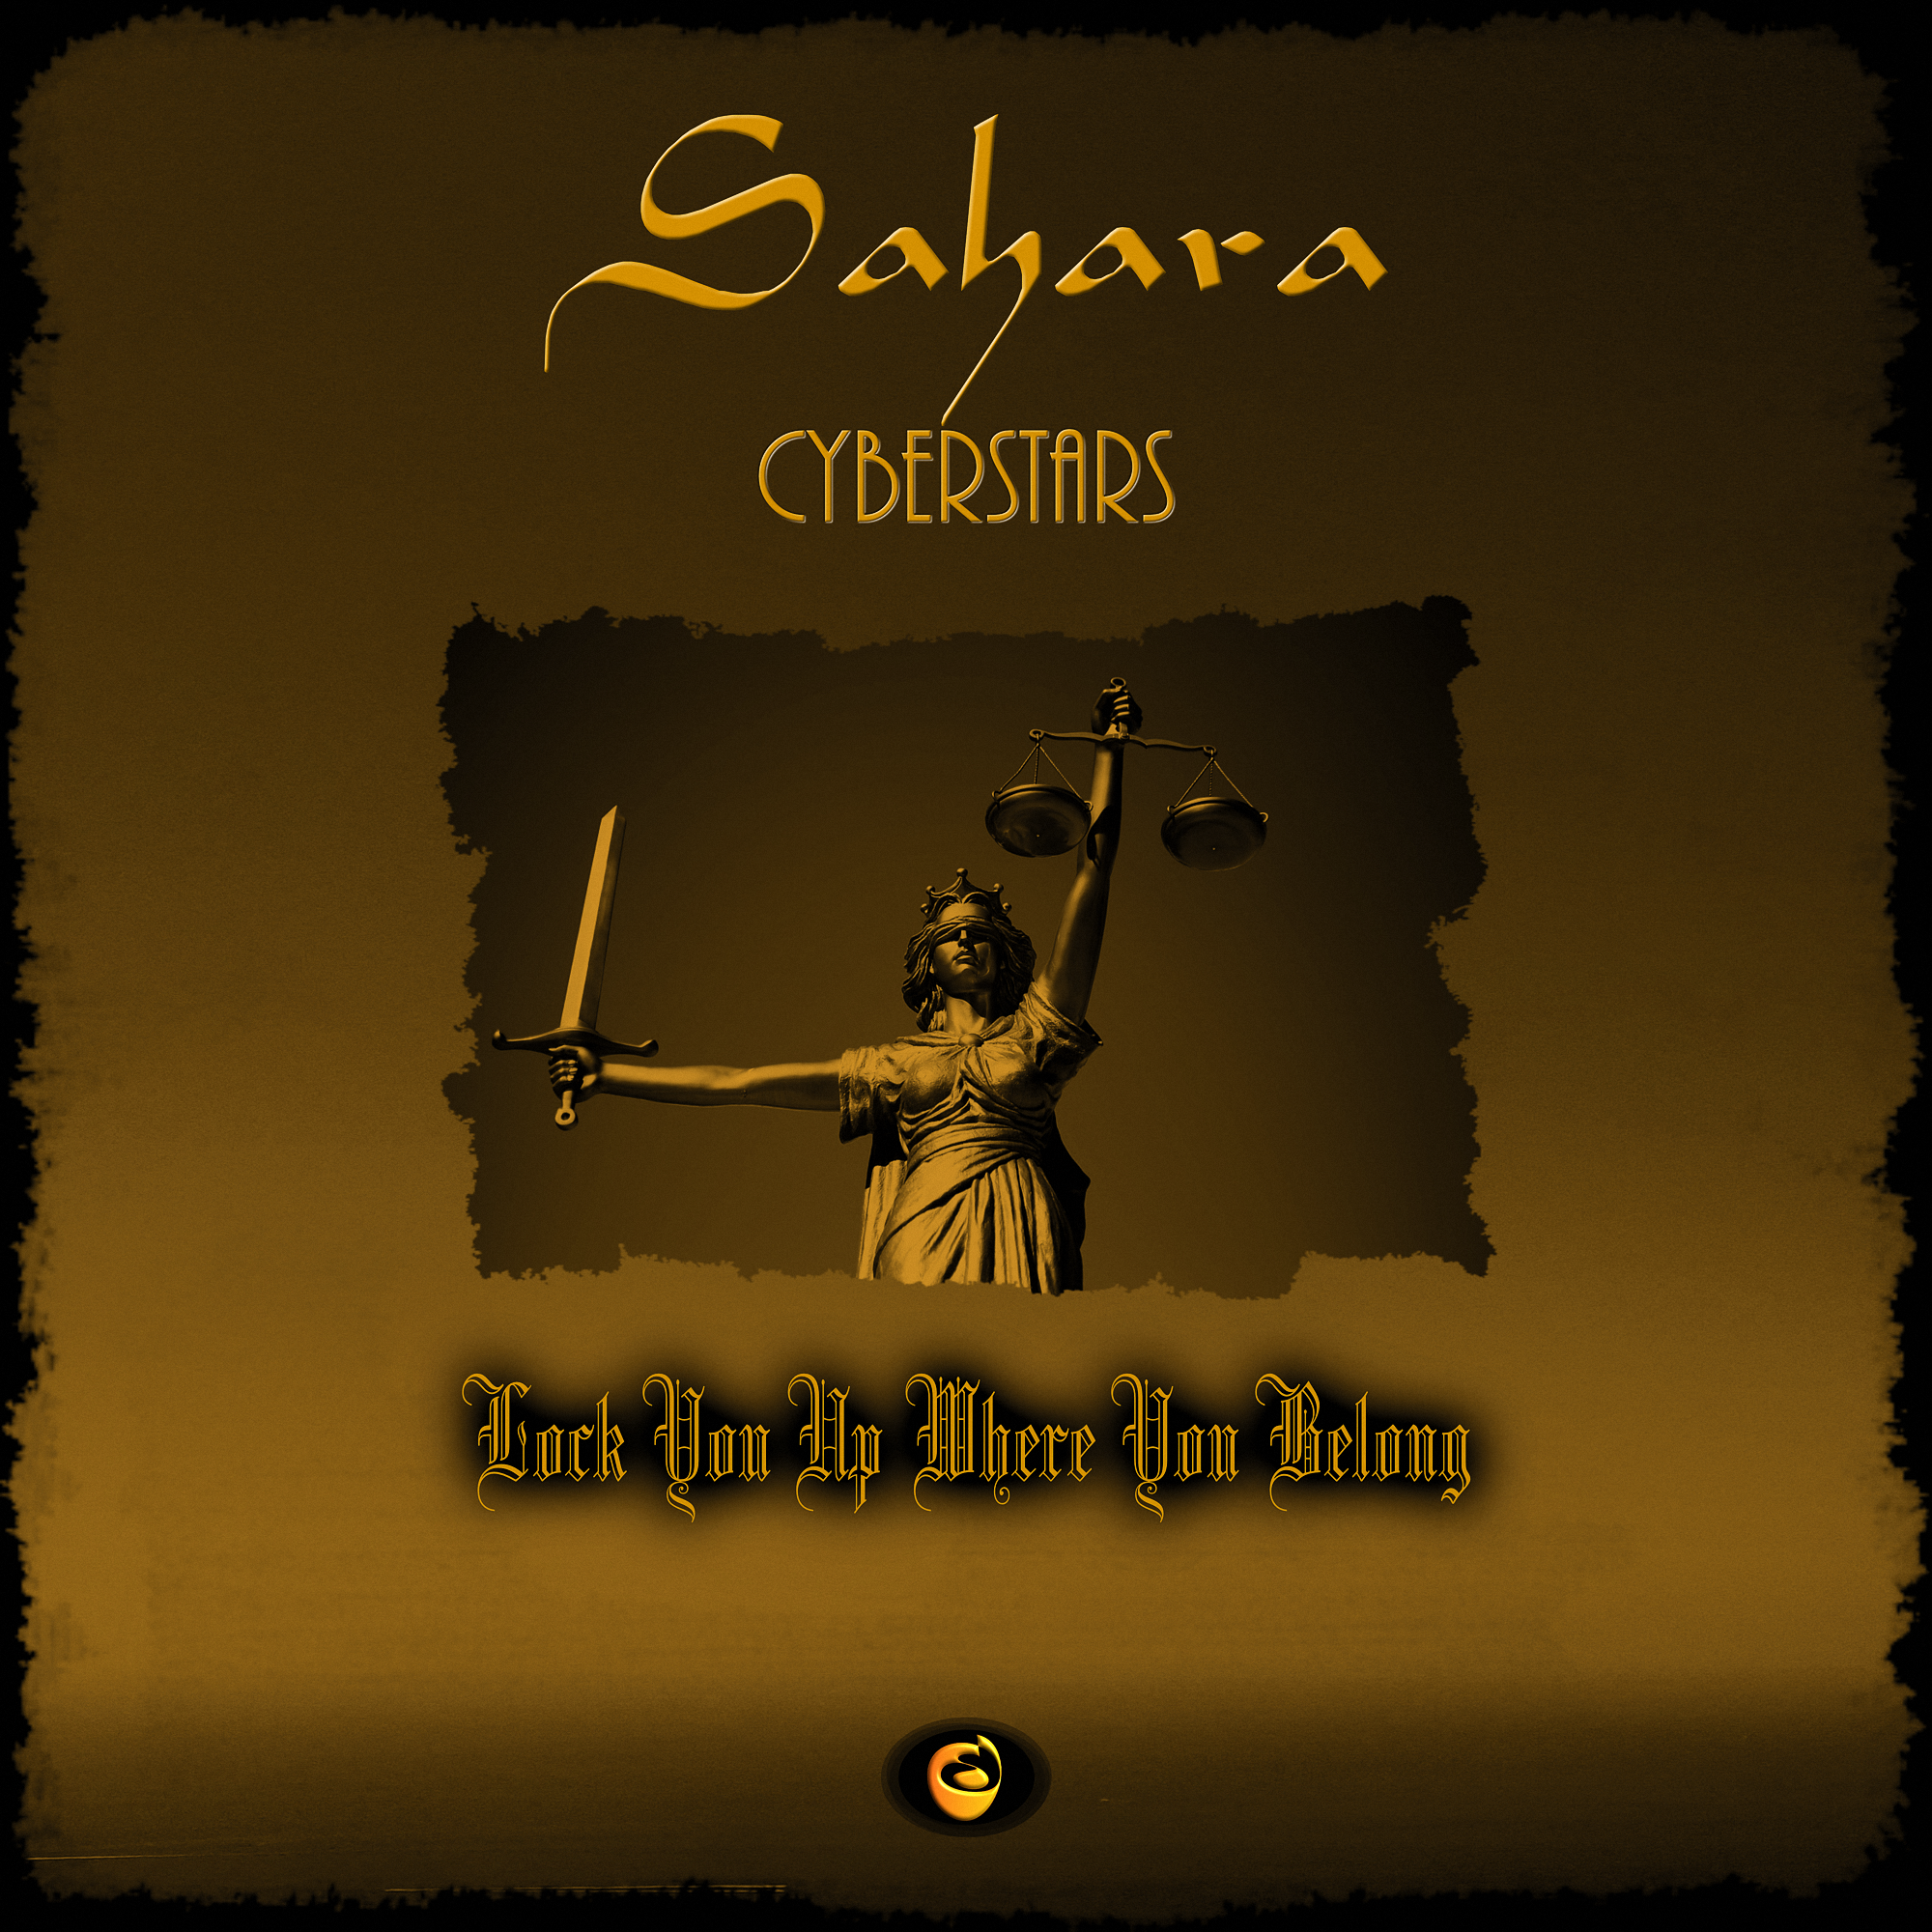 Sahara 'Lock you up where you belong' CD Single Cover 2000